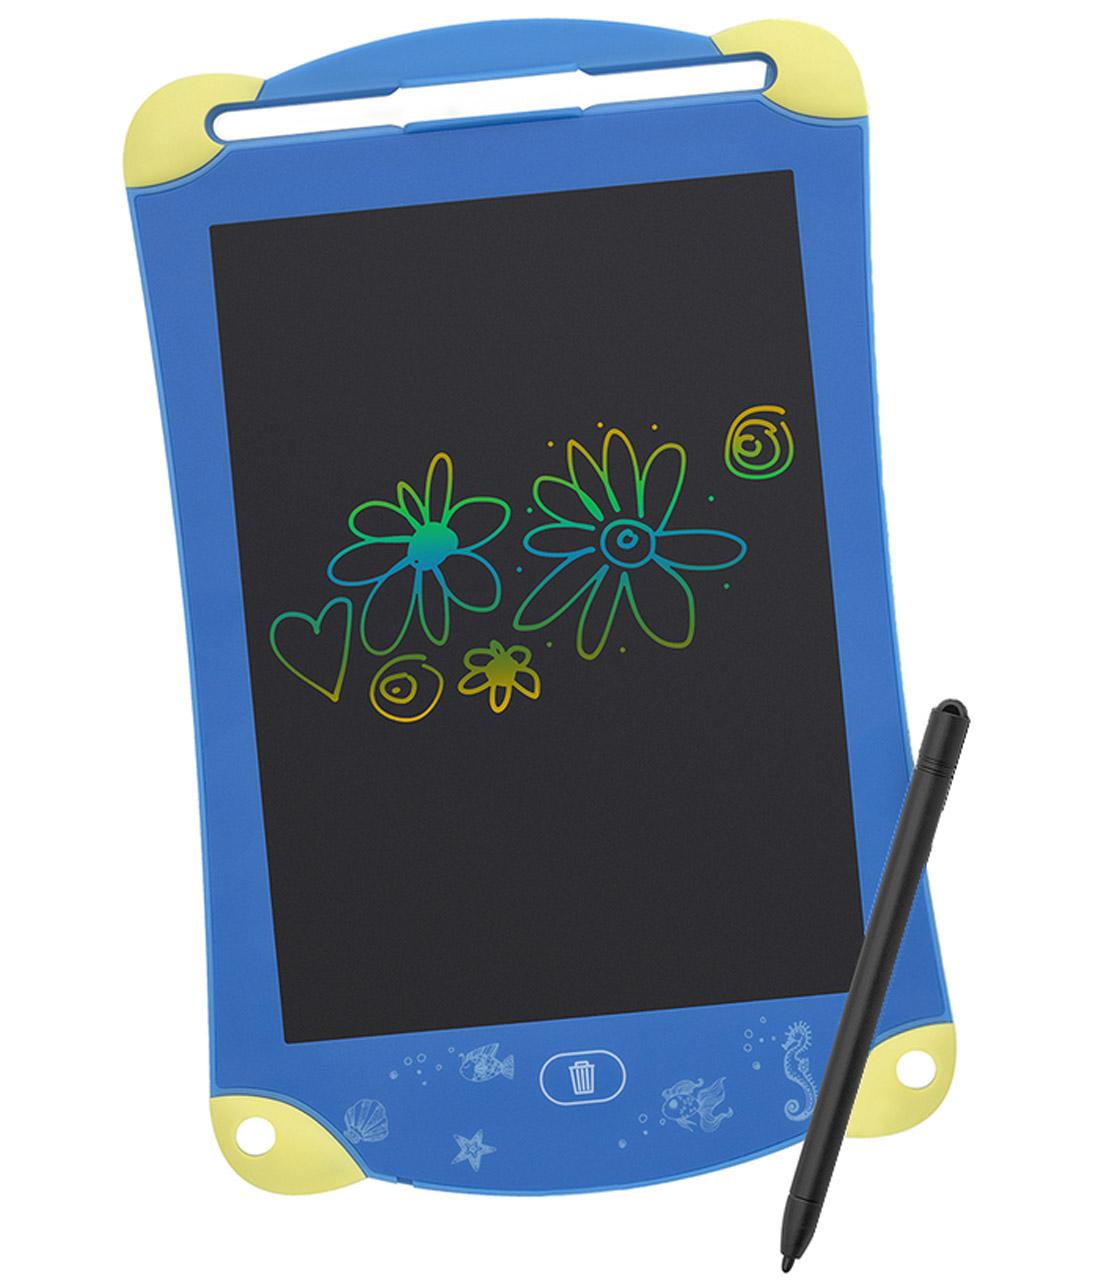 Wedo-LCD-Schreib-Maltafel-Rainbow-farbe-Zaubertafel-Kinder-66_998503-lafueliki